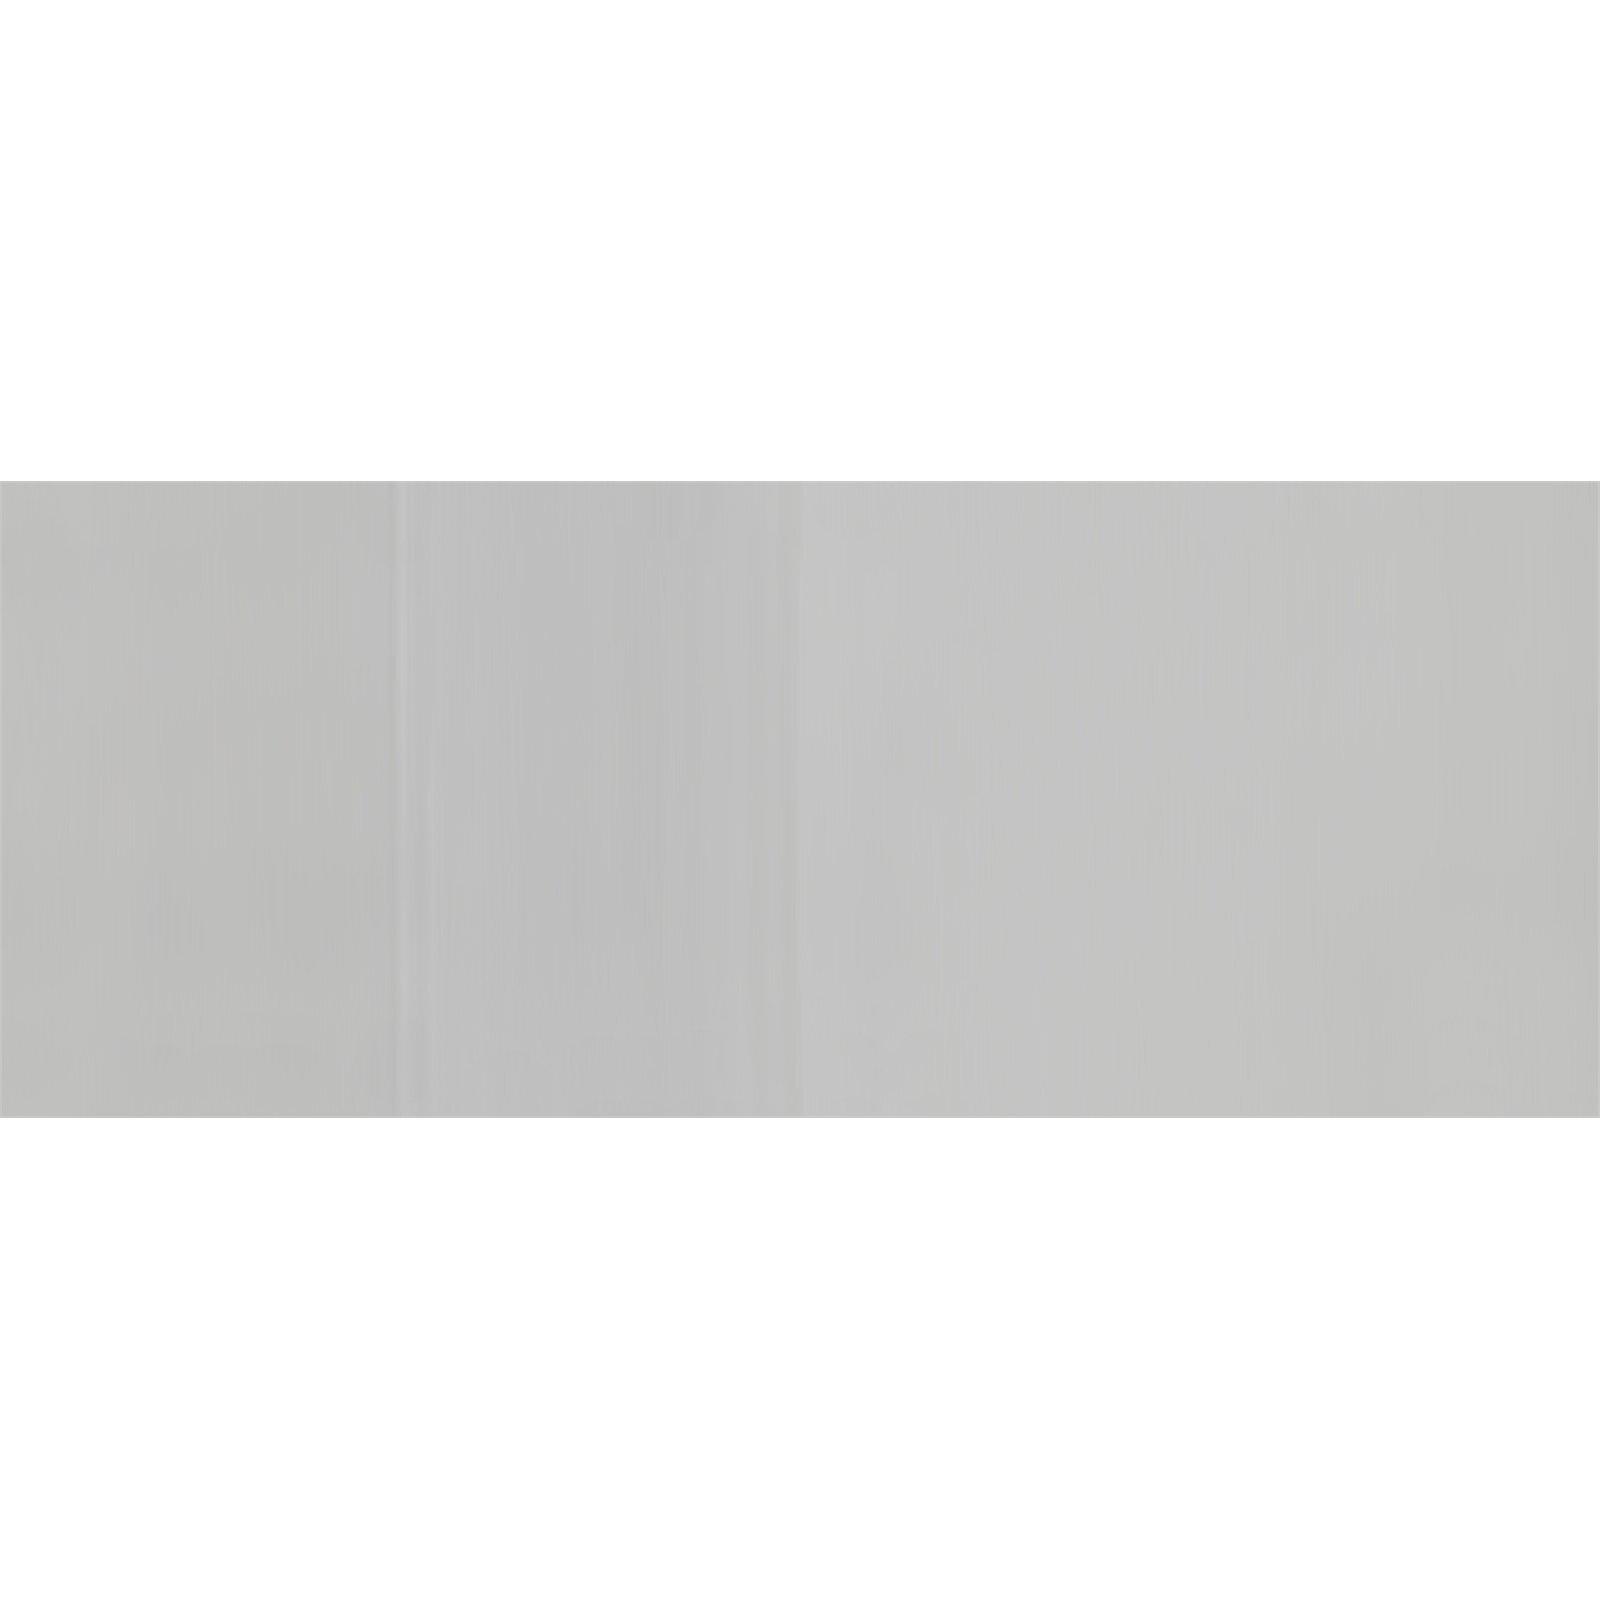 CSR Cemintel 2100 x 1200 x 9mm Express Panel